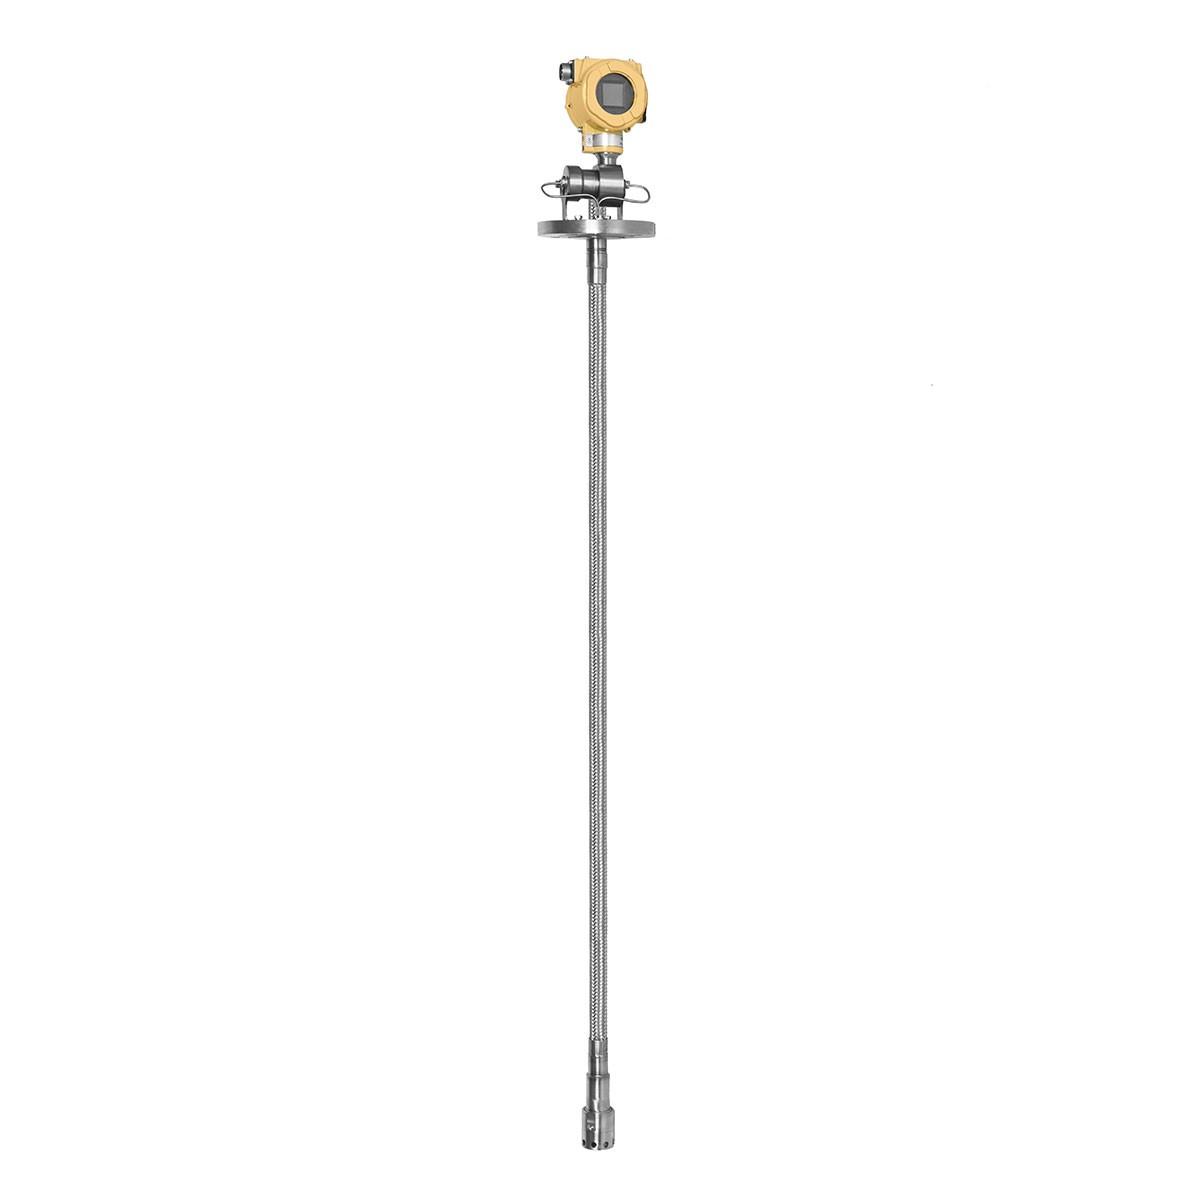 Smart Hydrostatic Pressure Transmitters Safir 2627, 2637, 2647 K